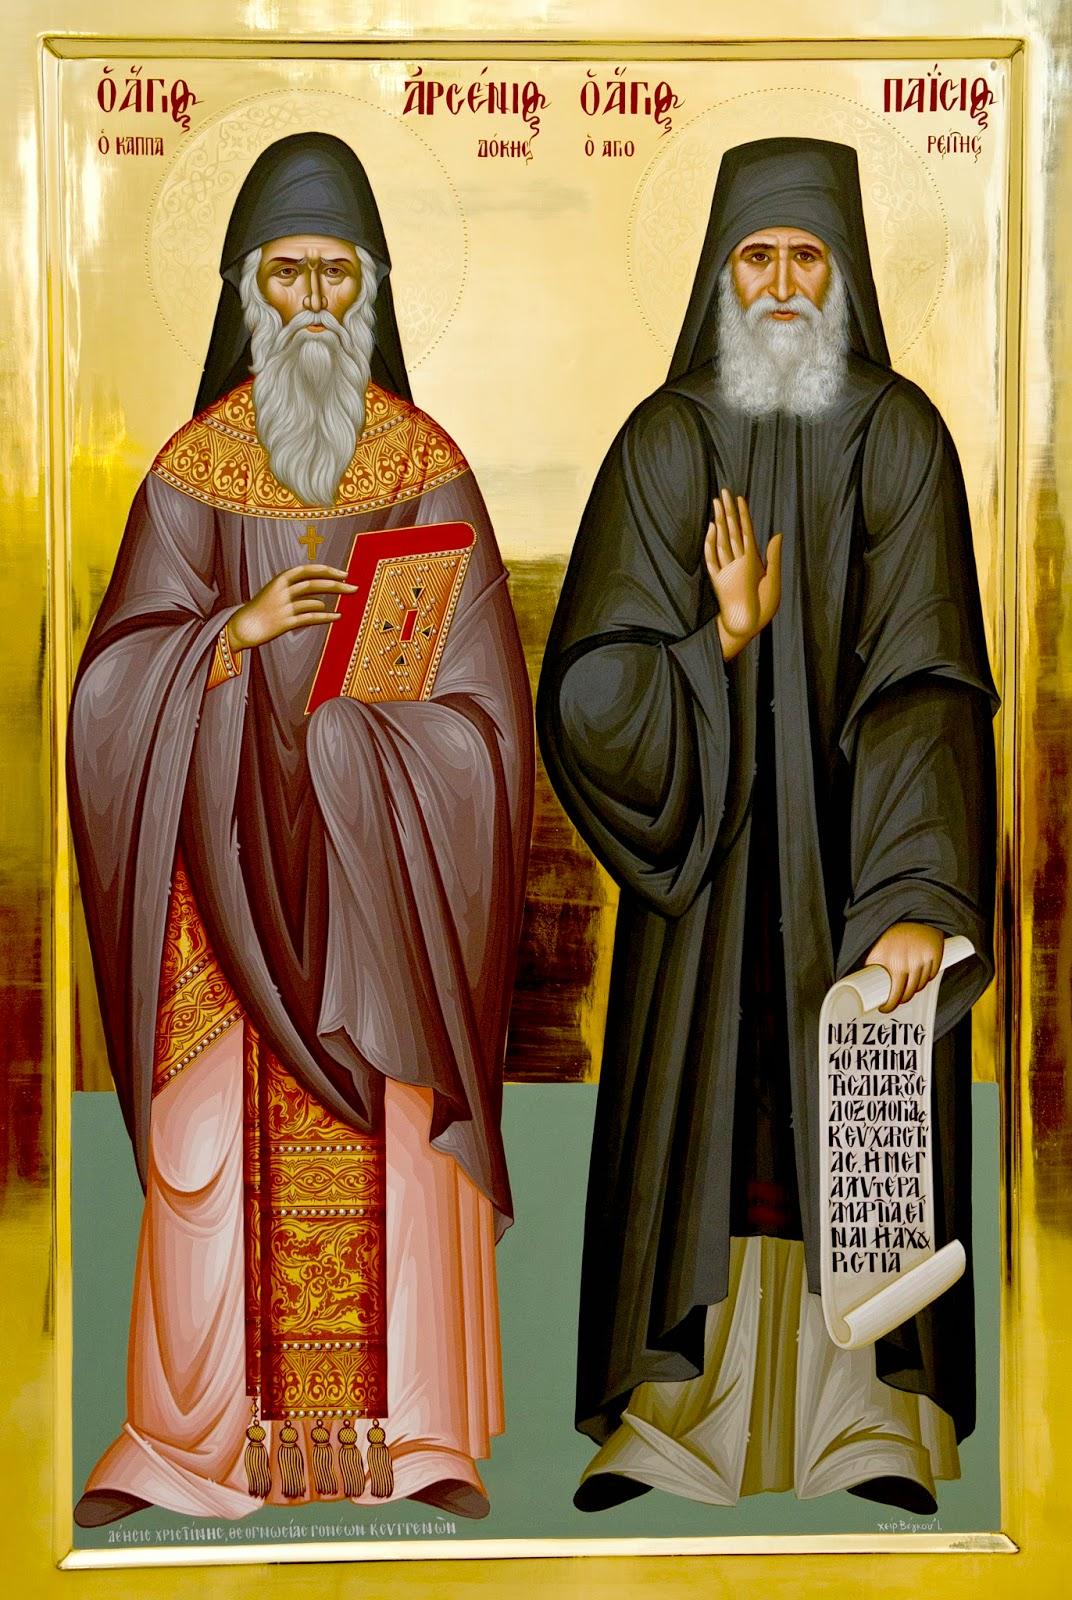 St. Paisios the Hagiorite (July 12) with St. Arsenios of Cappadocia (Nov. 10)